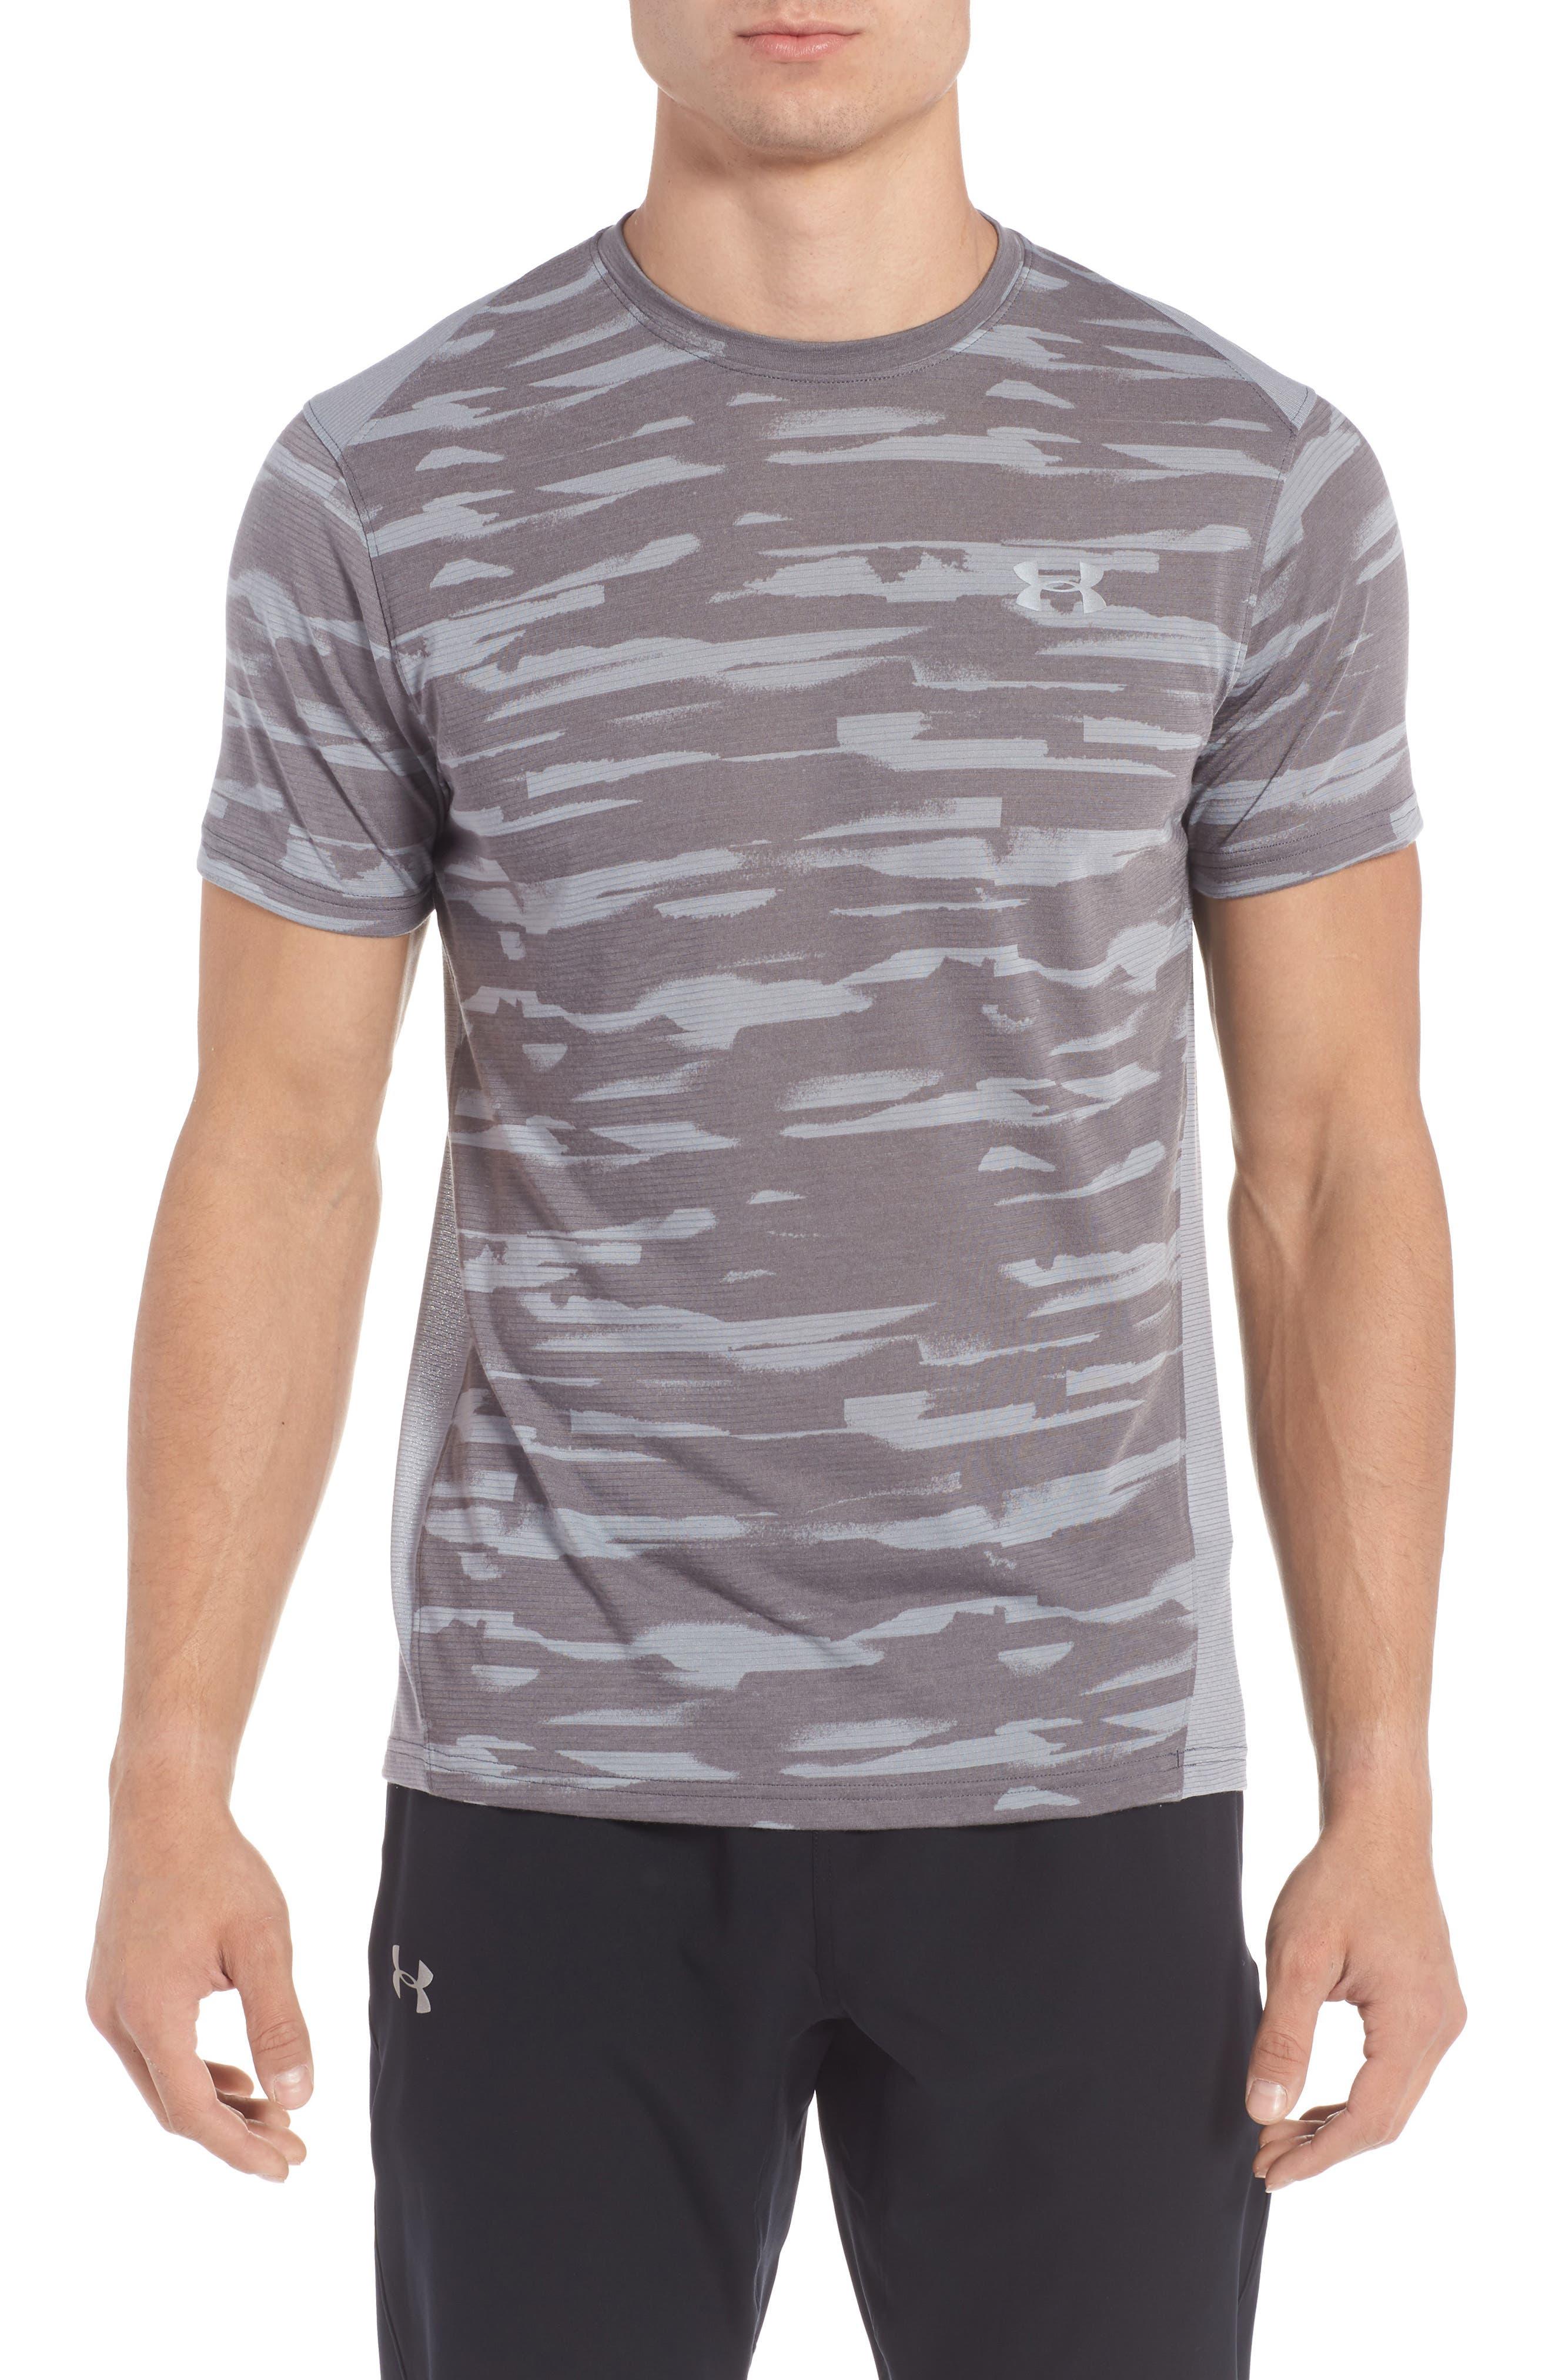 Threadborne Mesh Running T-Shirt,                             Main thumbnail 1, color,                             Grey / Black / Reflective